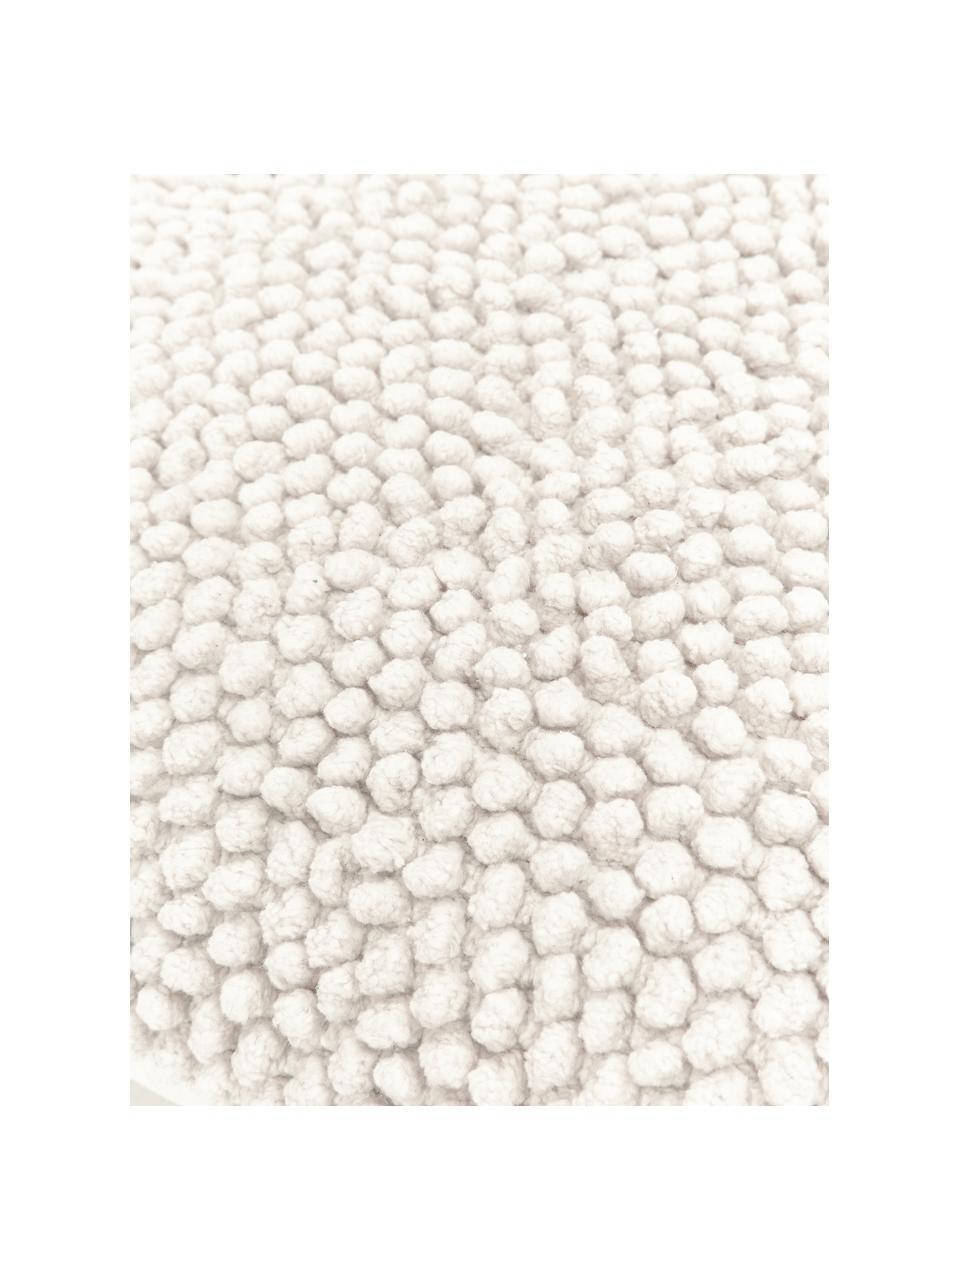 Federa arredo in cotone bianco crema Indi, 100% cotone, Bianco latteo, Larg. 45 x Lung. 45 cm